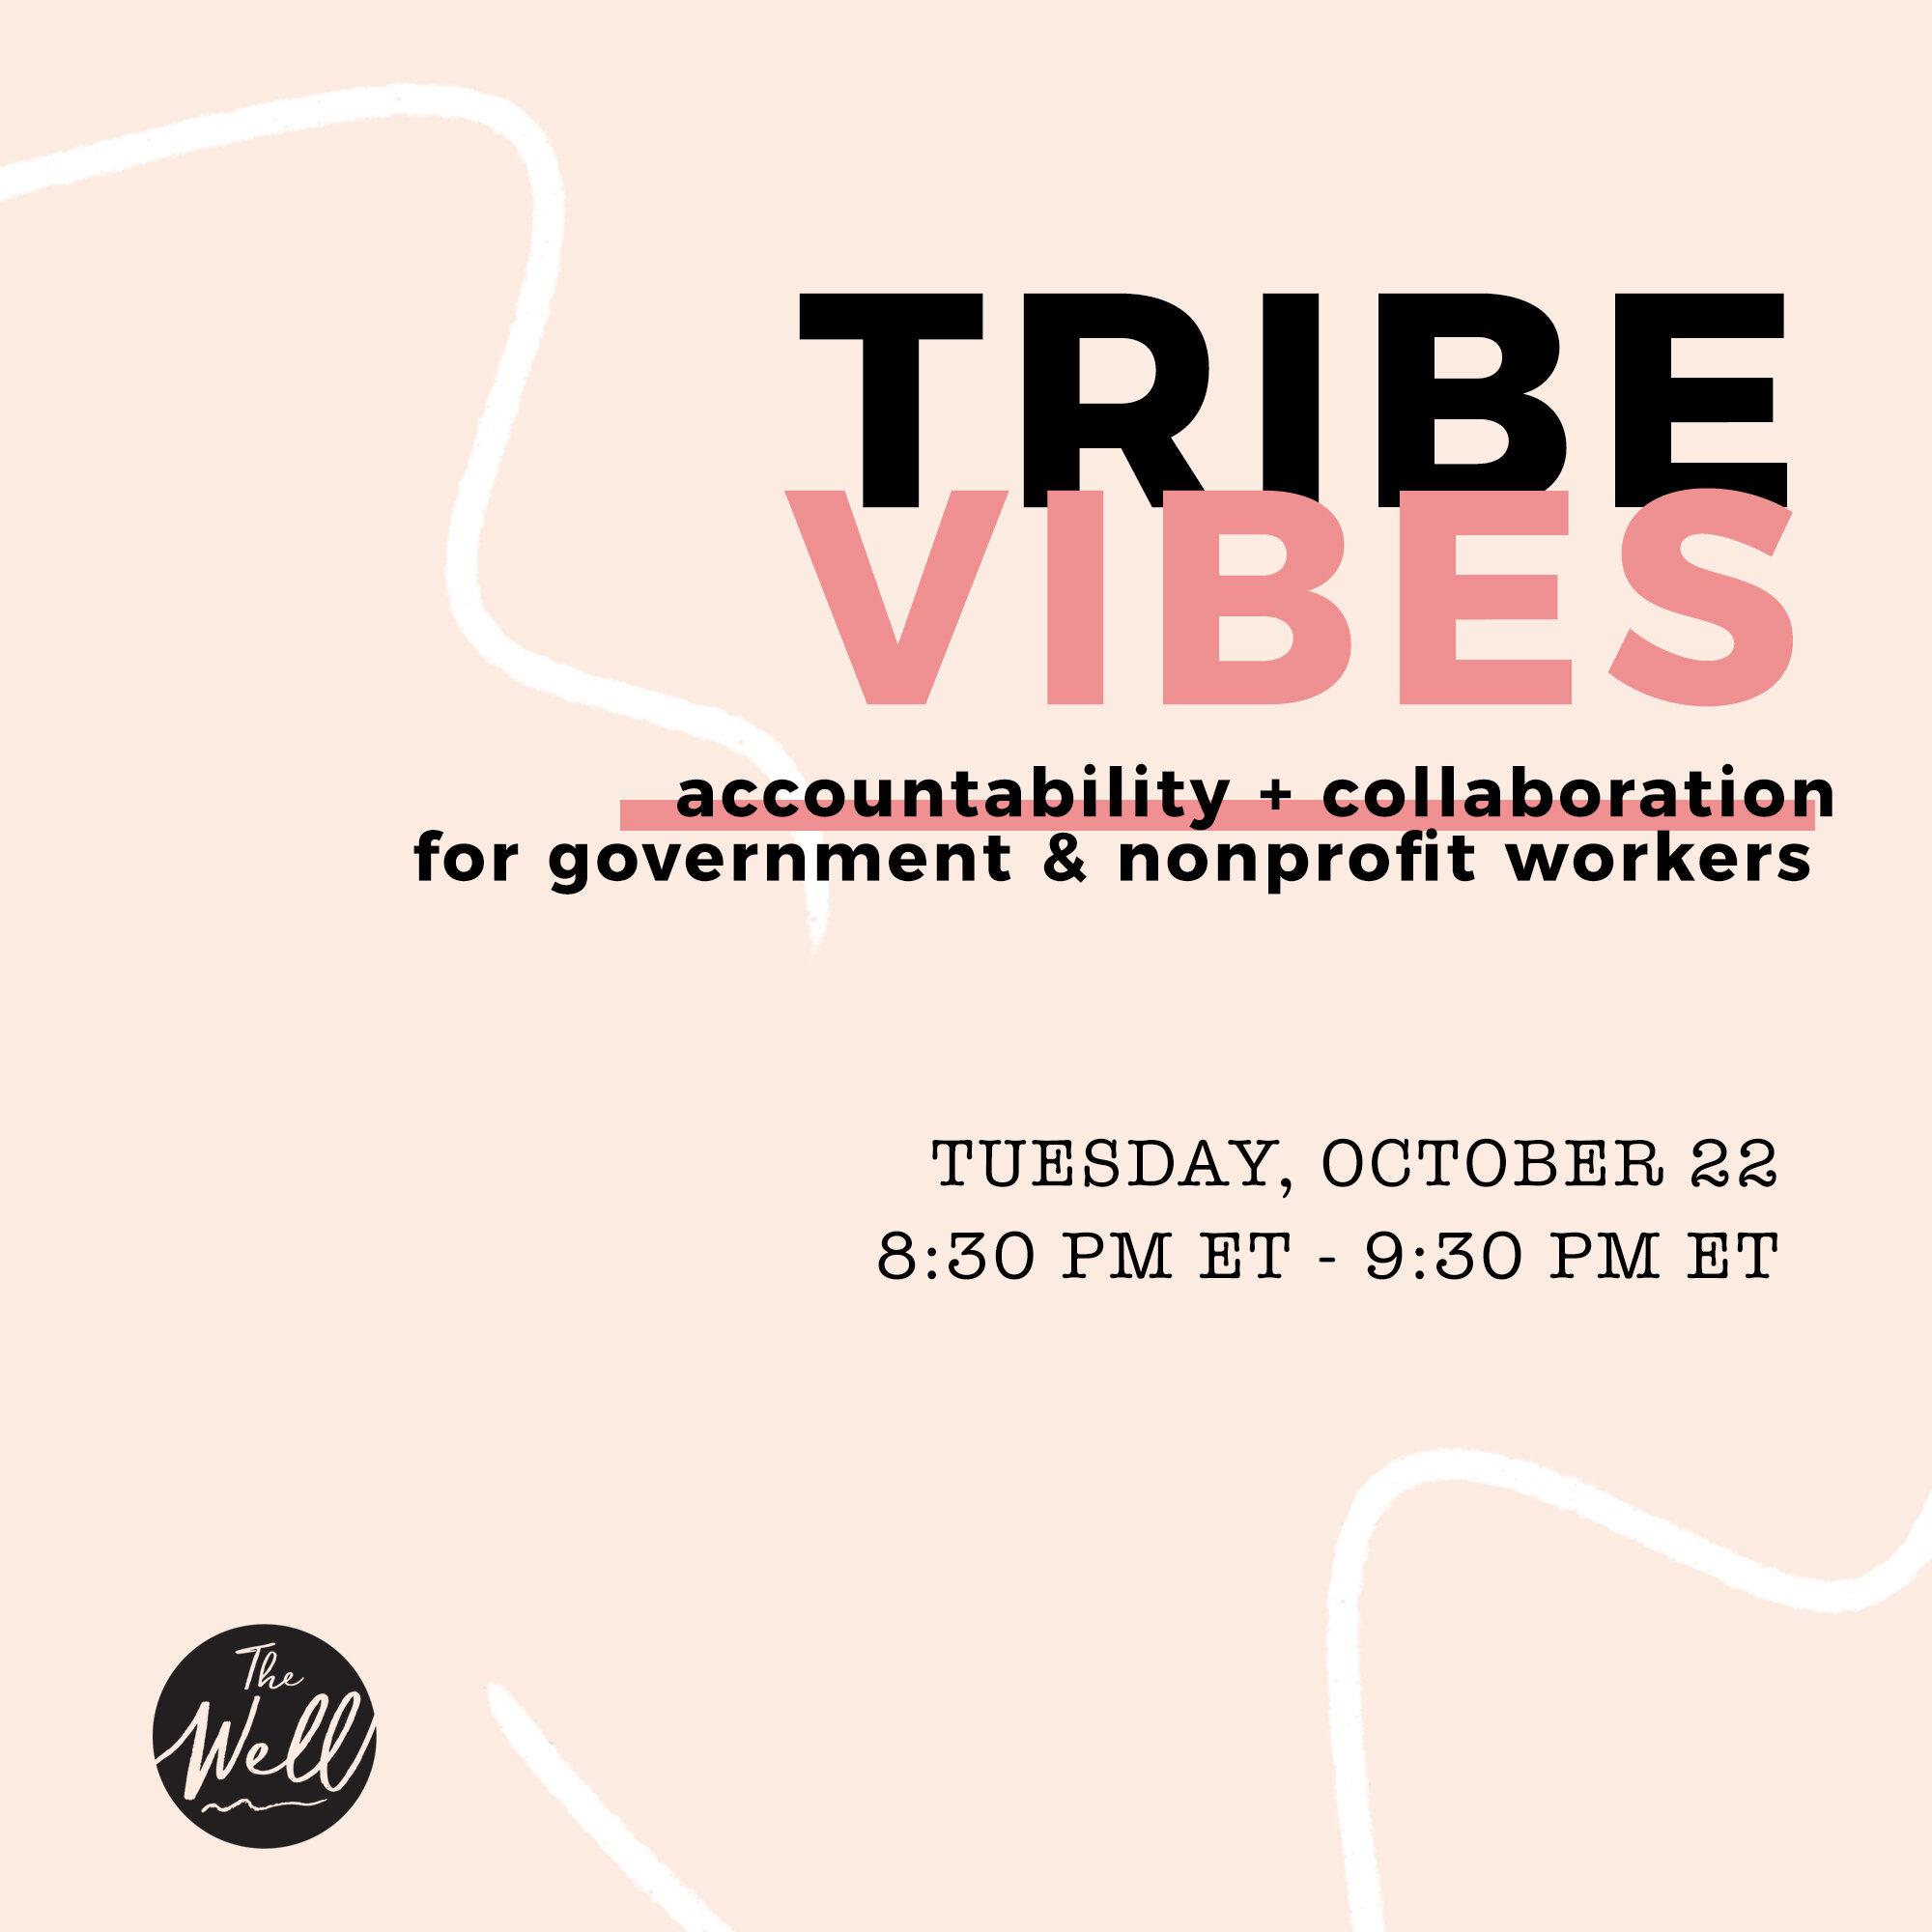 tribe-vibes-10222019.jpg